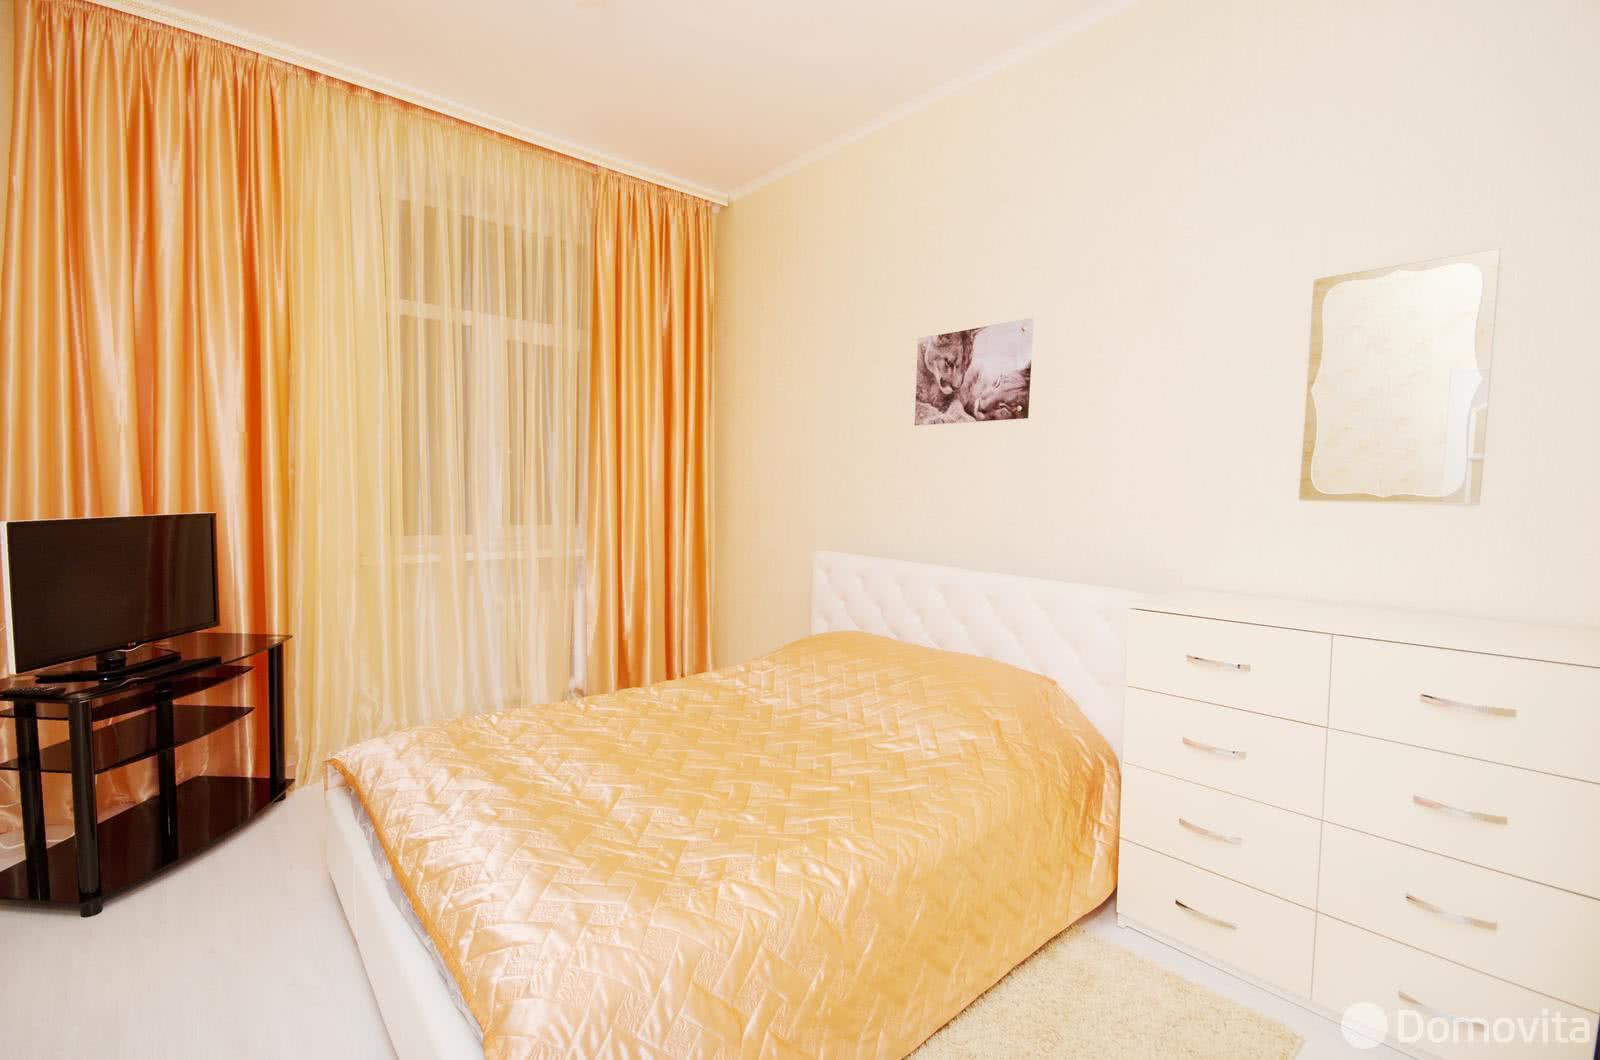 Аренда 2-комнатной квартиры на сутки в Минске пр-т Независимости, д. 40 - фото 4